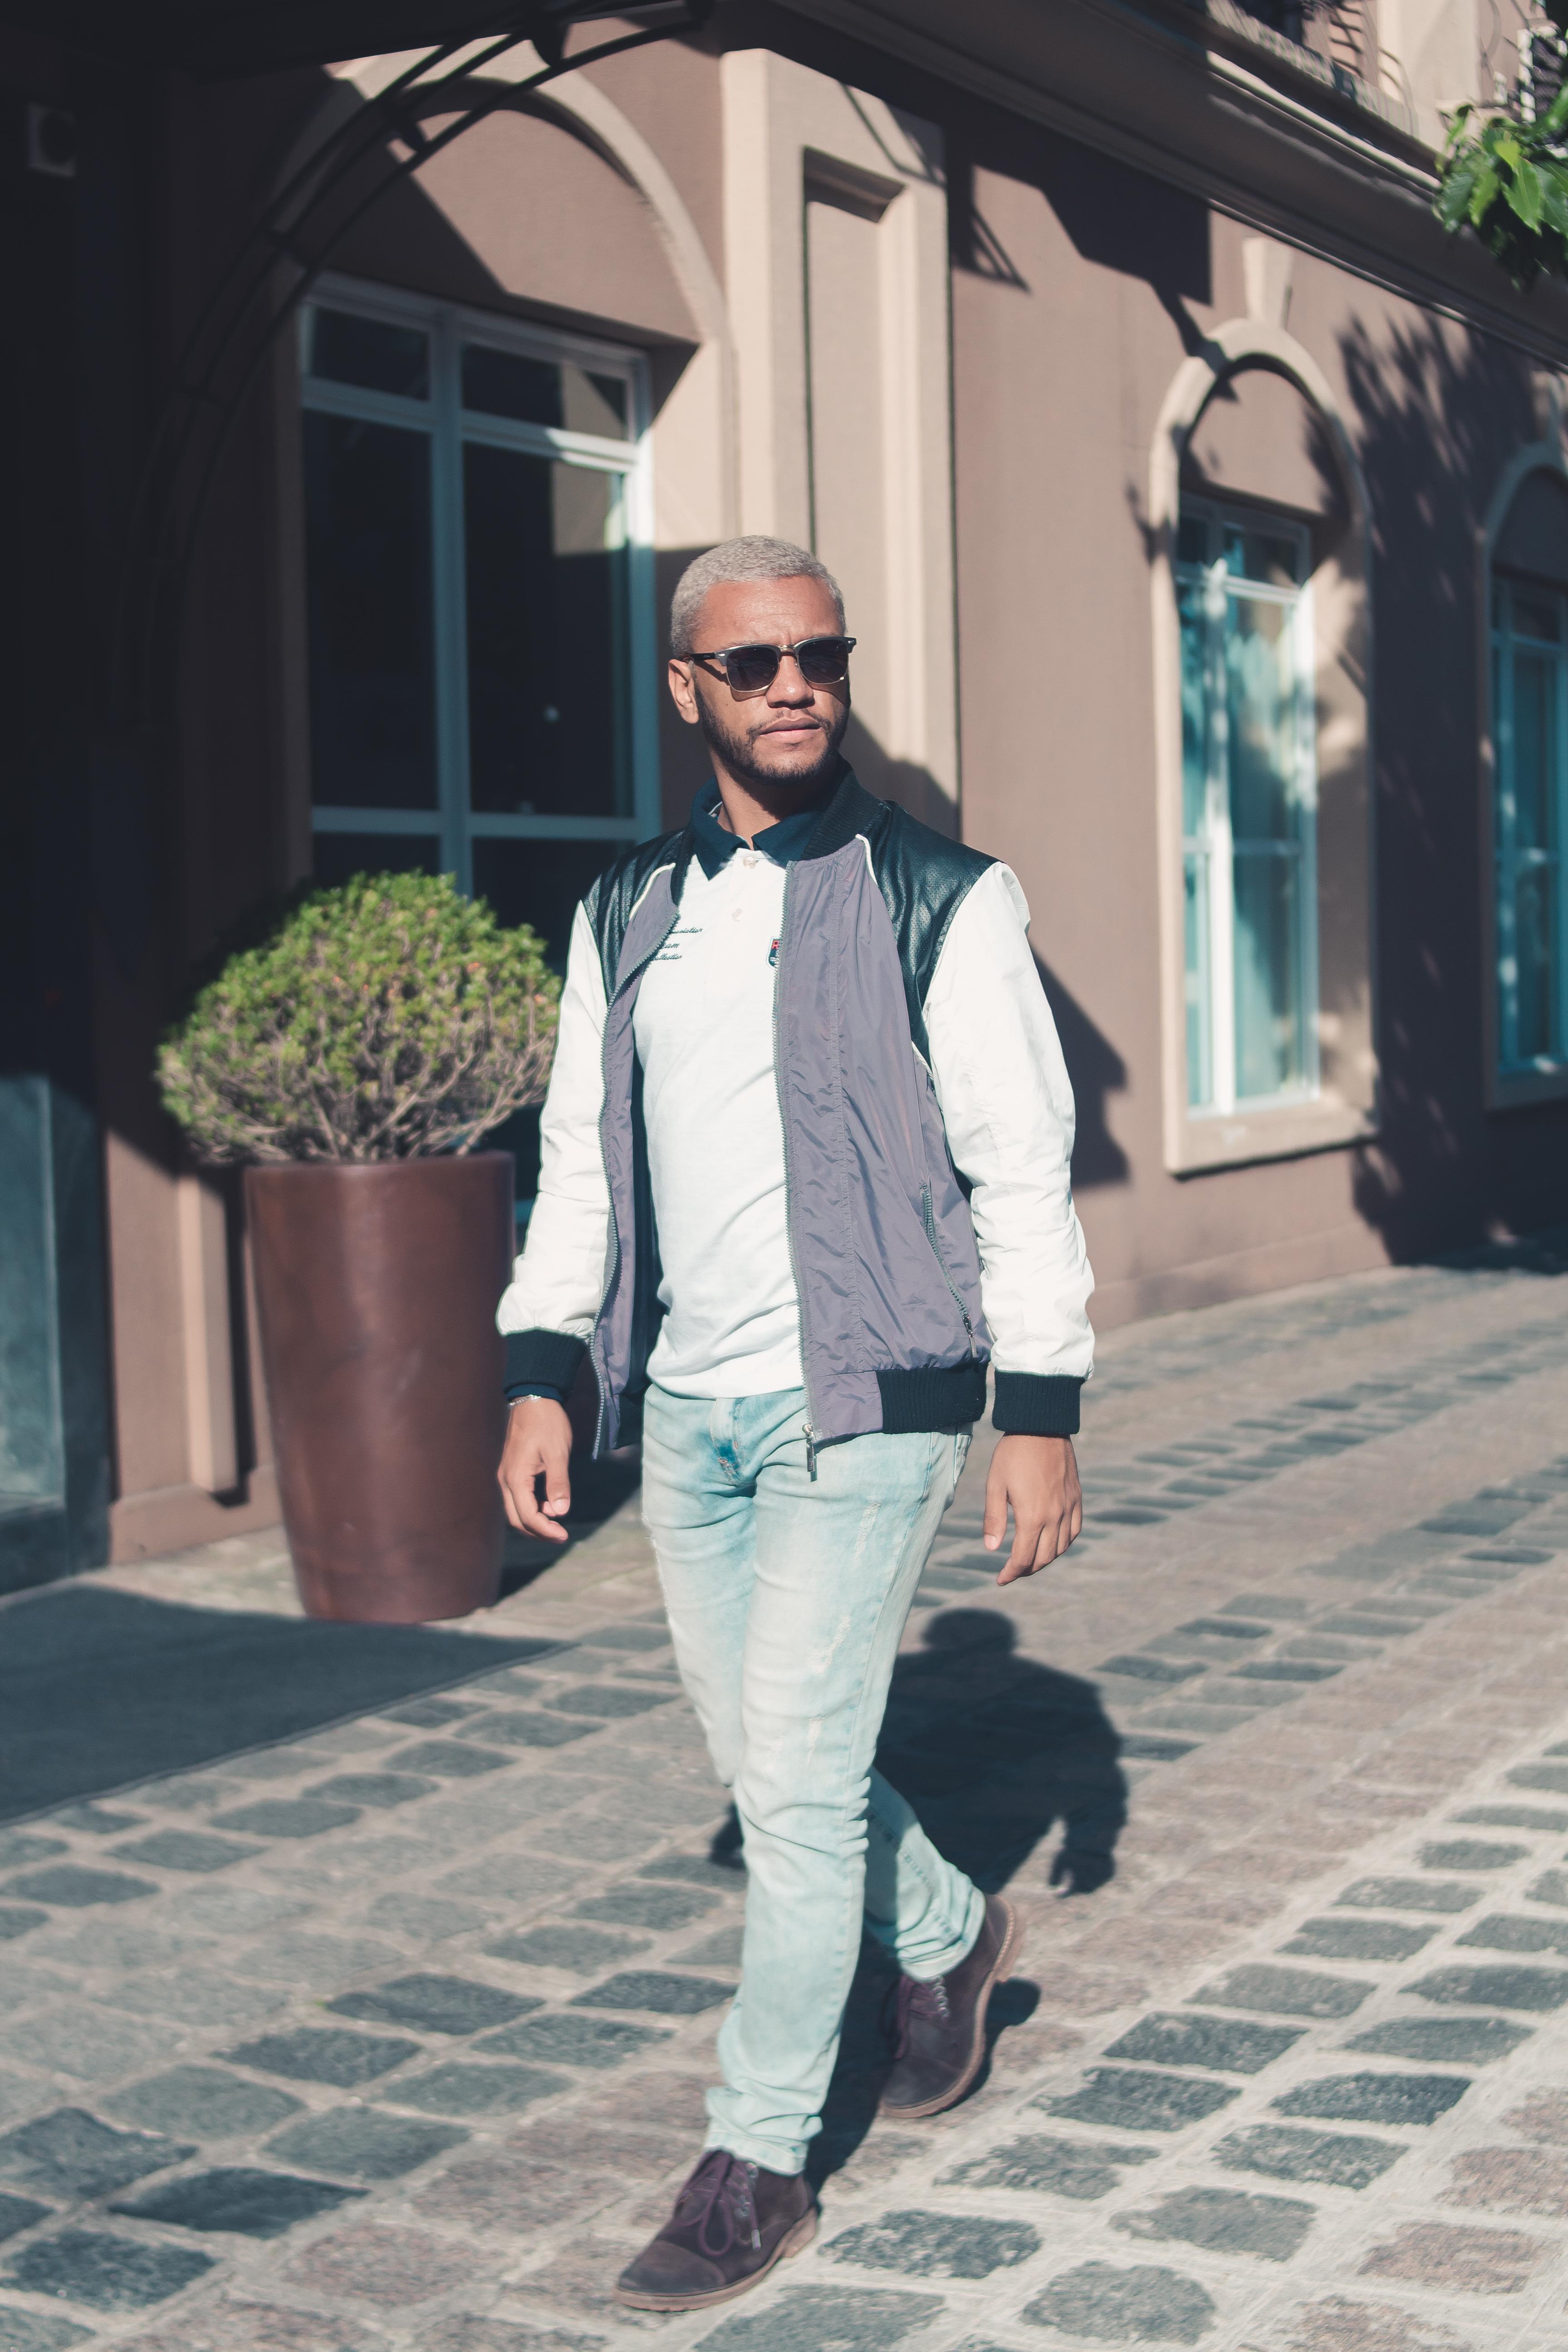 Man Wearing Blue Jeans Walking Beside Brown Vase